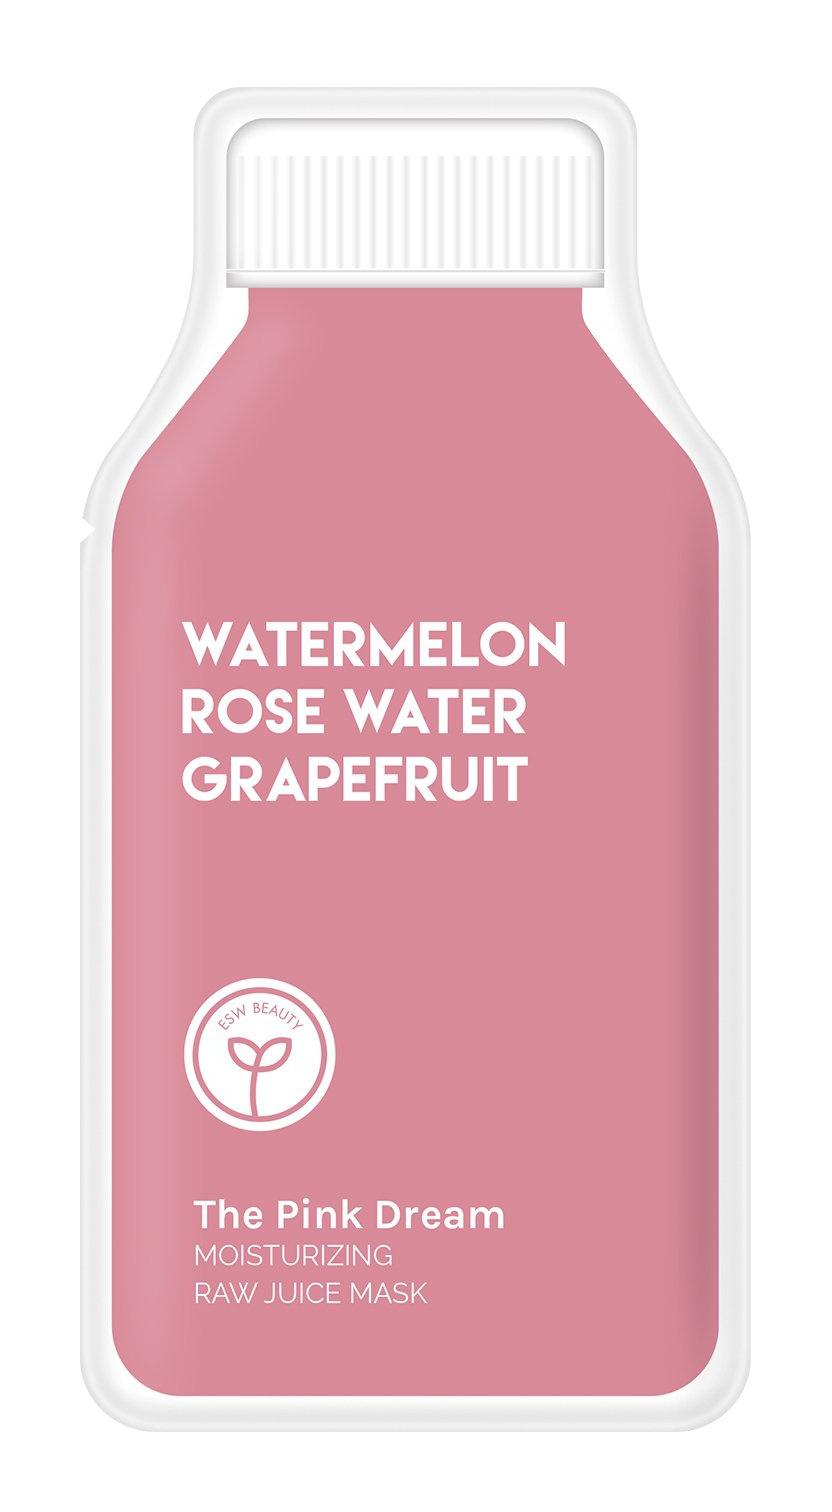 ESW Beauty The Pink Dream Moisturizing Raw Juice Face Mask